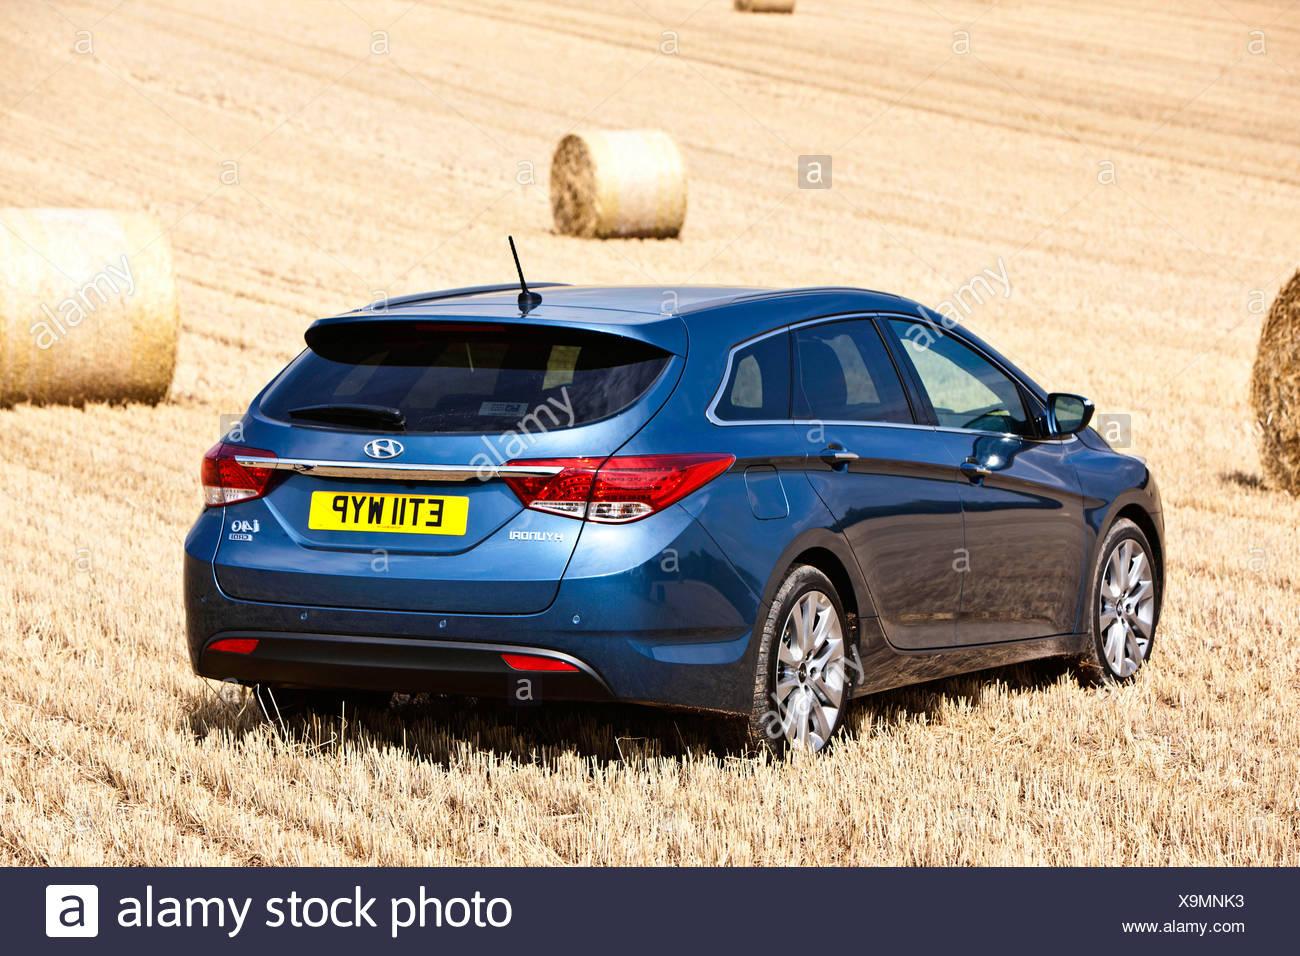 Hyundai i40, large family car, in a hayfield, Southampton, UK, 20 08 2012 - Stock Image